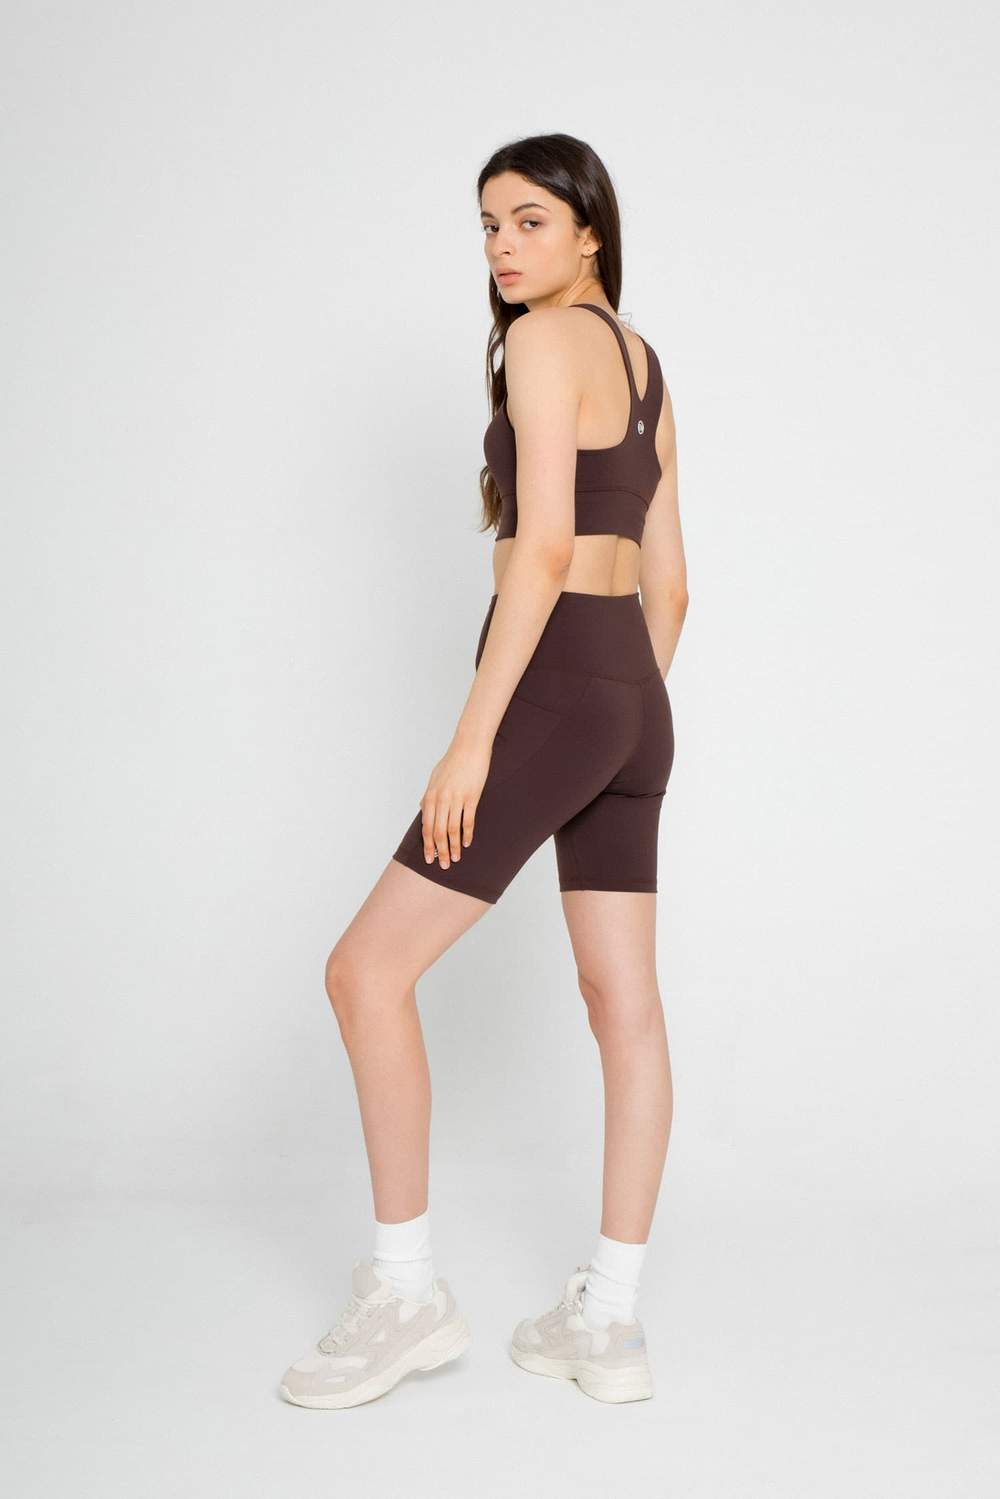 SAHARA BIKER SHORTS by ENVT, available on enavantactive.com for $64 Emily Ratajkowski Shorts Exact Product